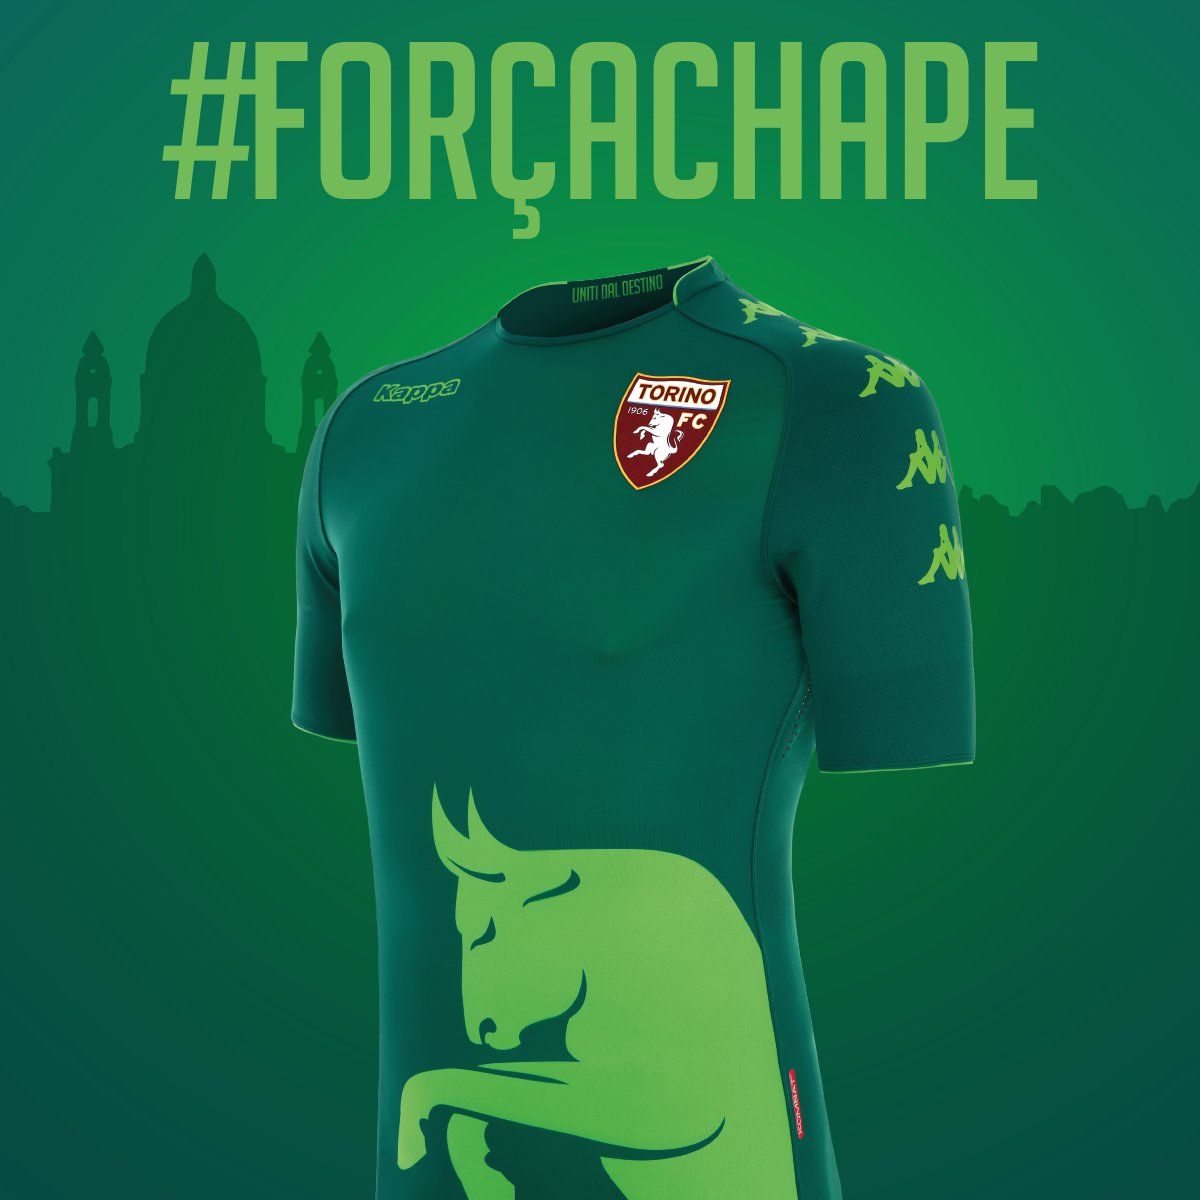 Torino FC 2017 18 Chapecoense Tribute Kit – FOOTBALL FASHION.ORG 8489369e79a47